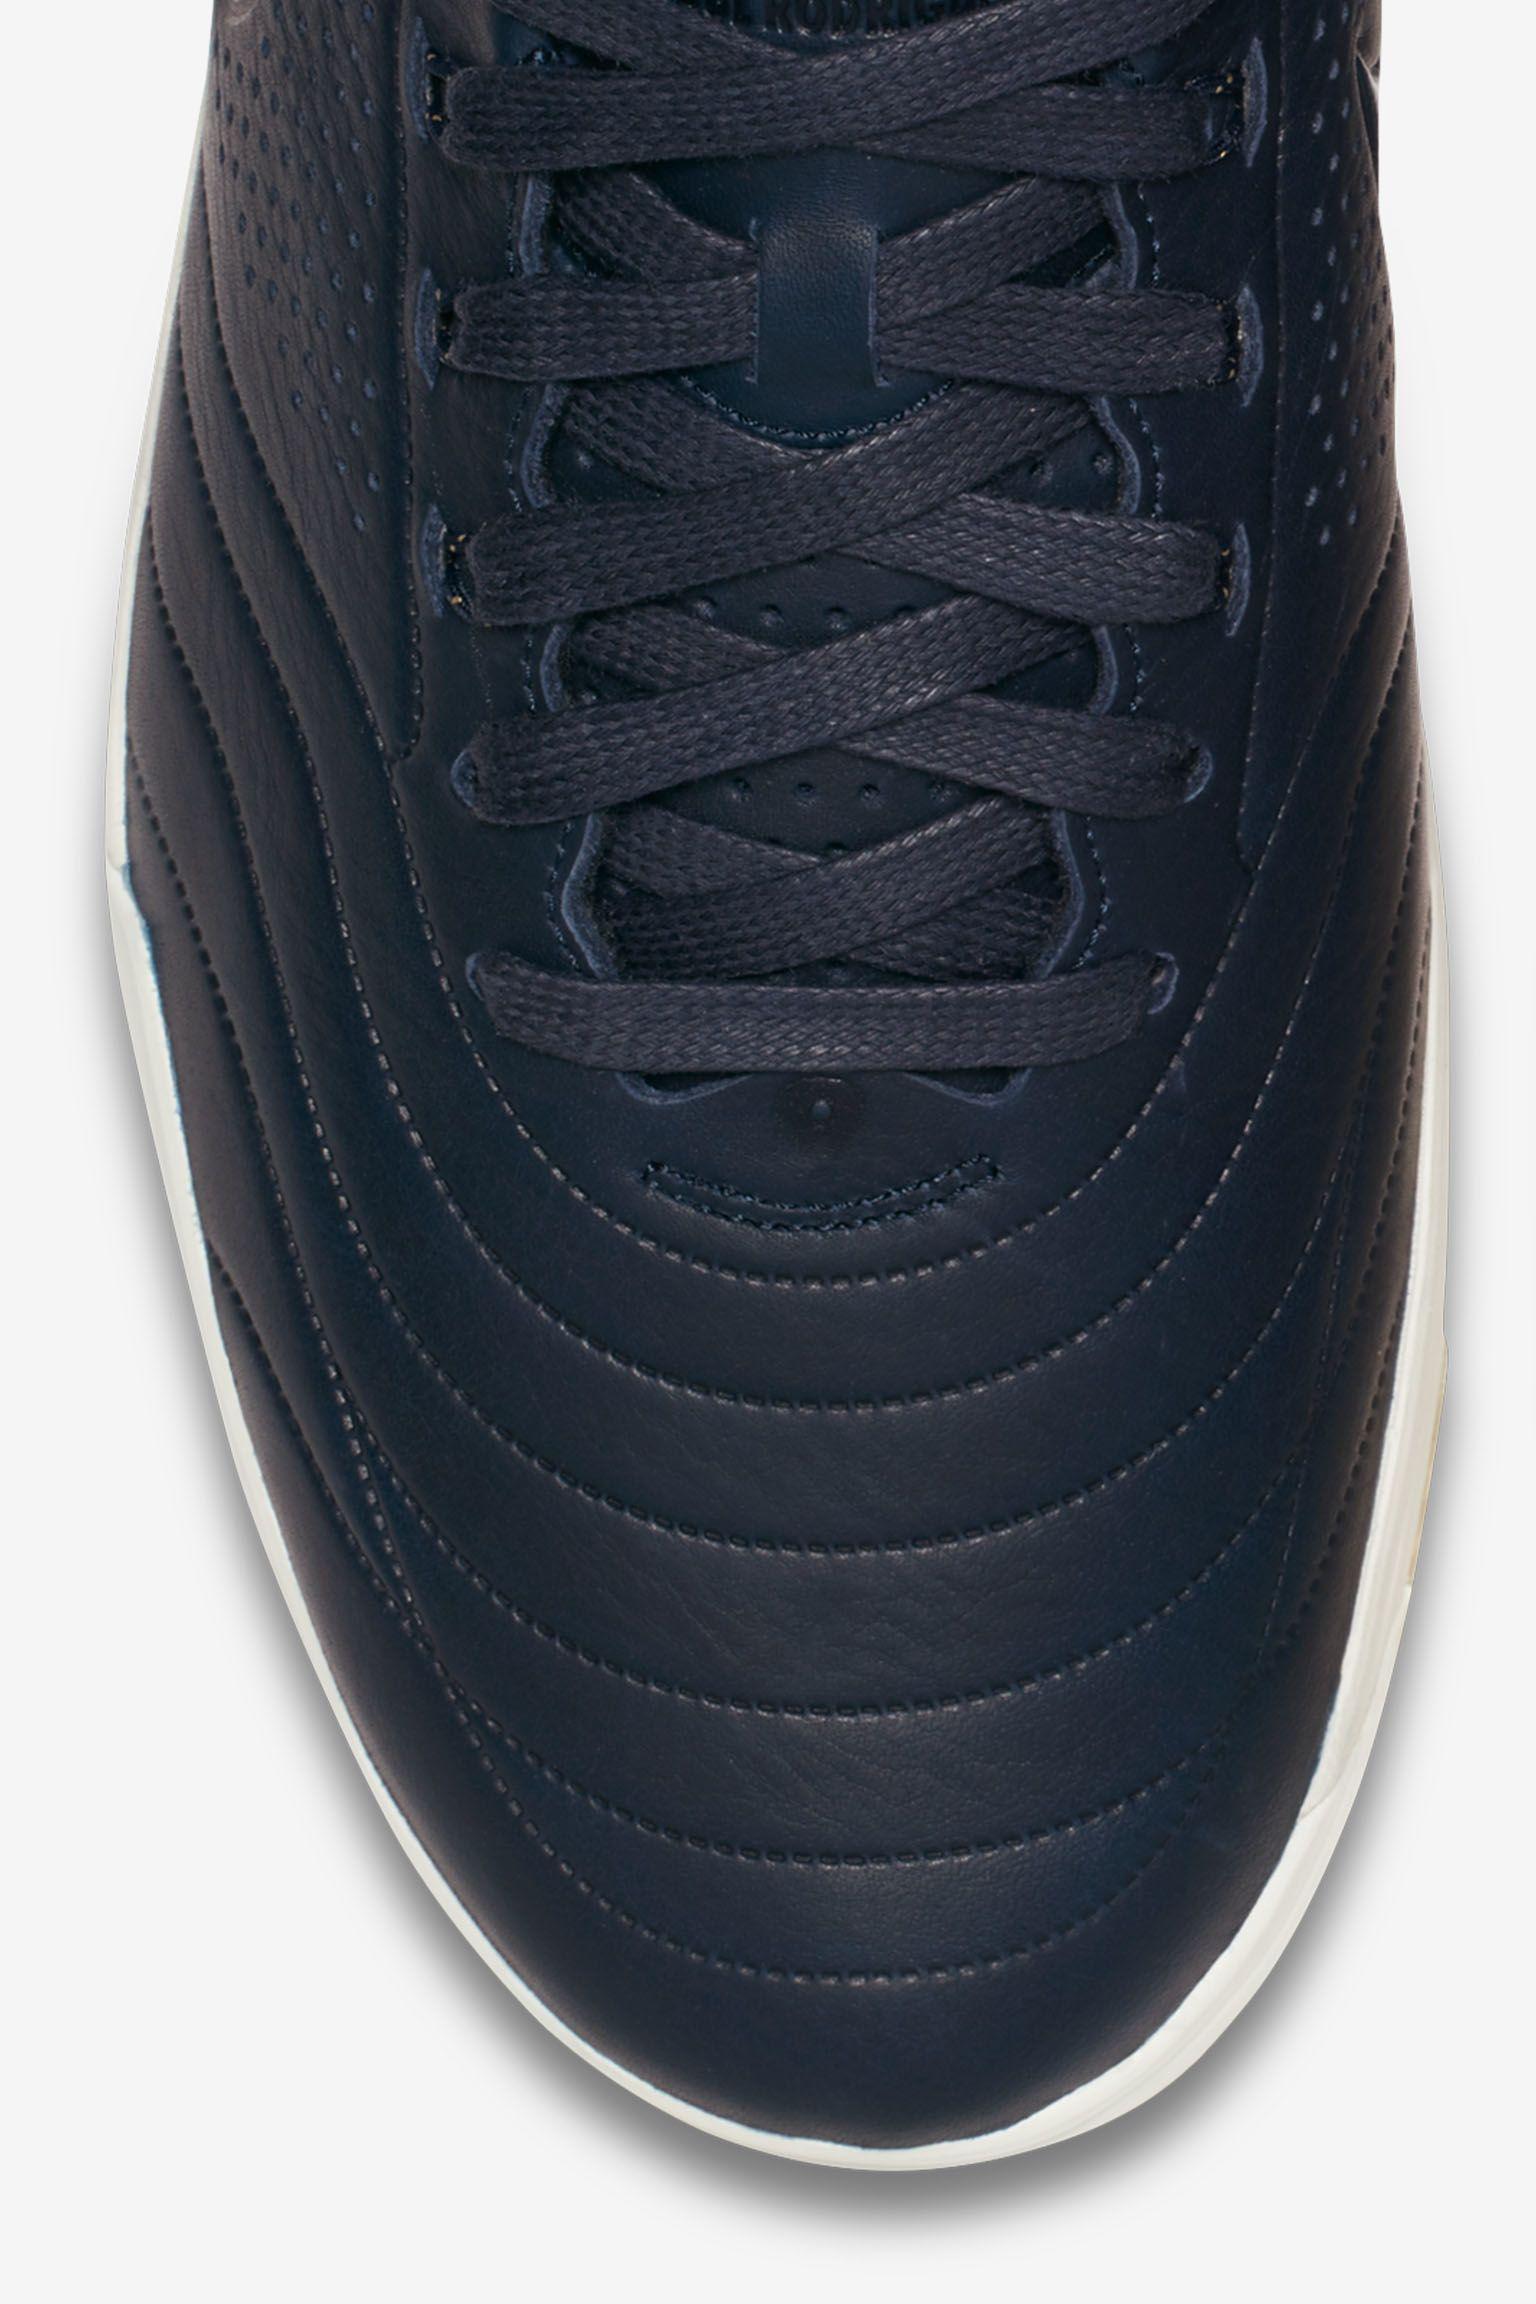 Nike Paul Rodriguez 9 Elite 'SBxFB'